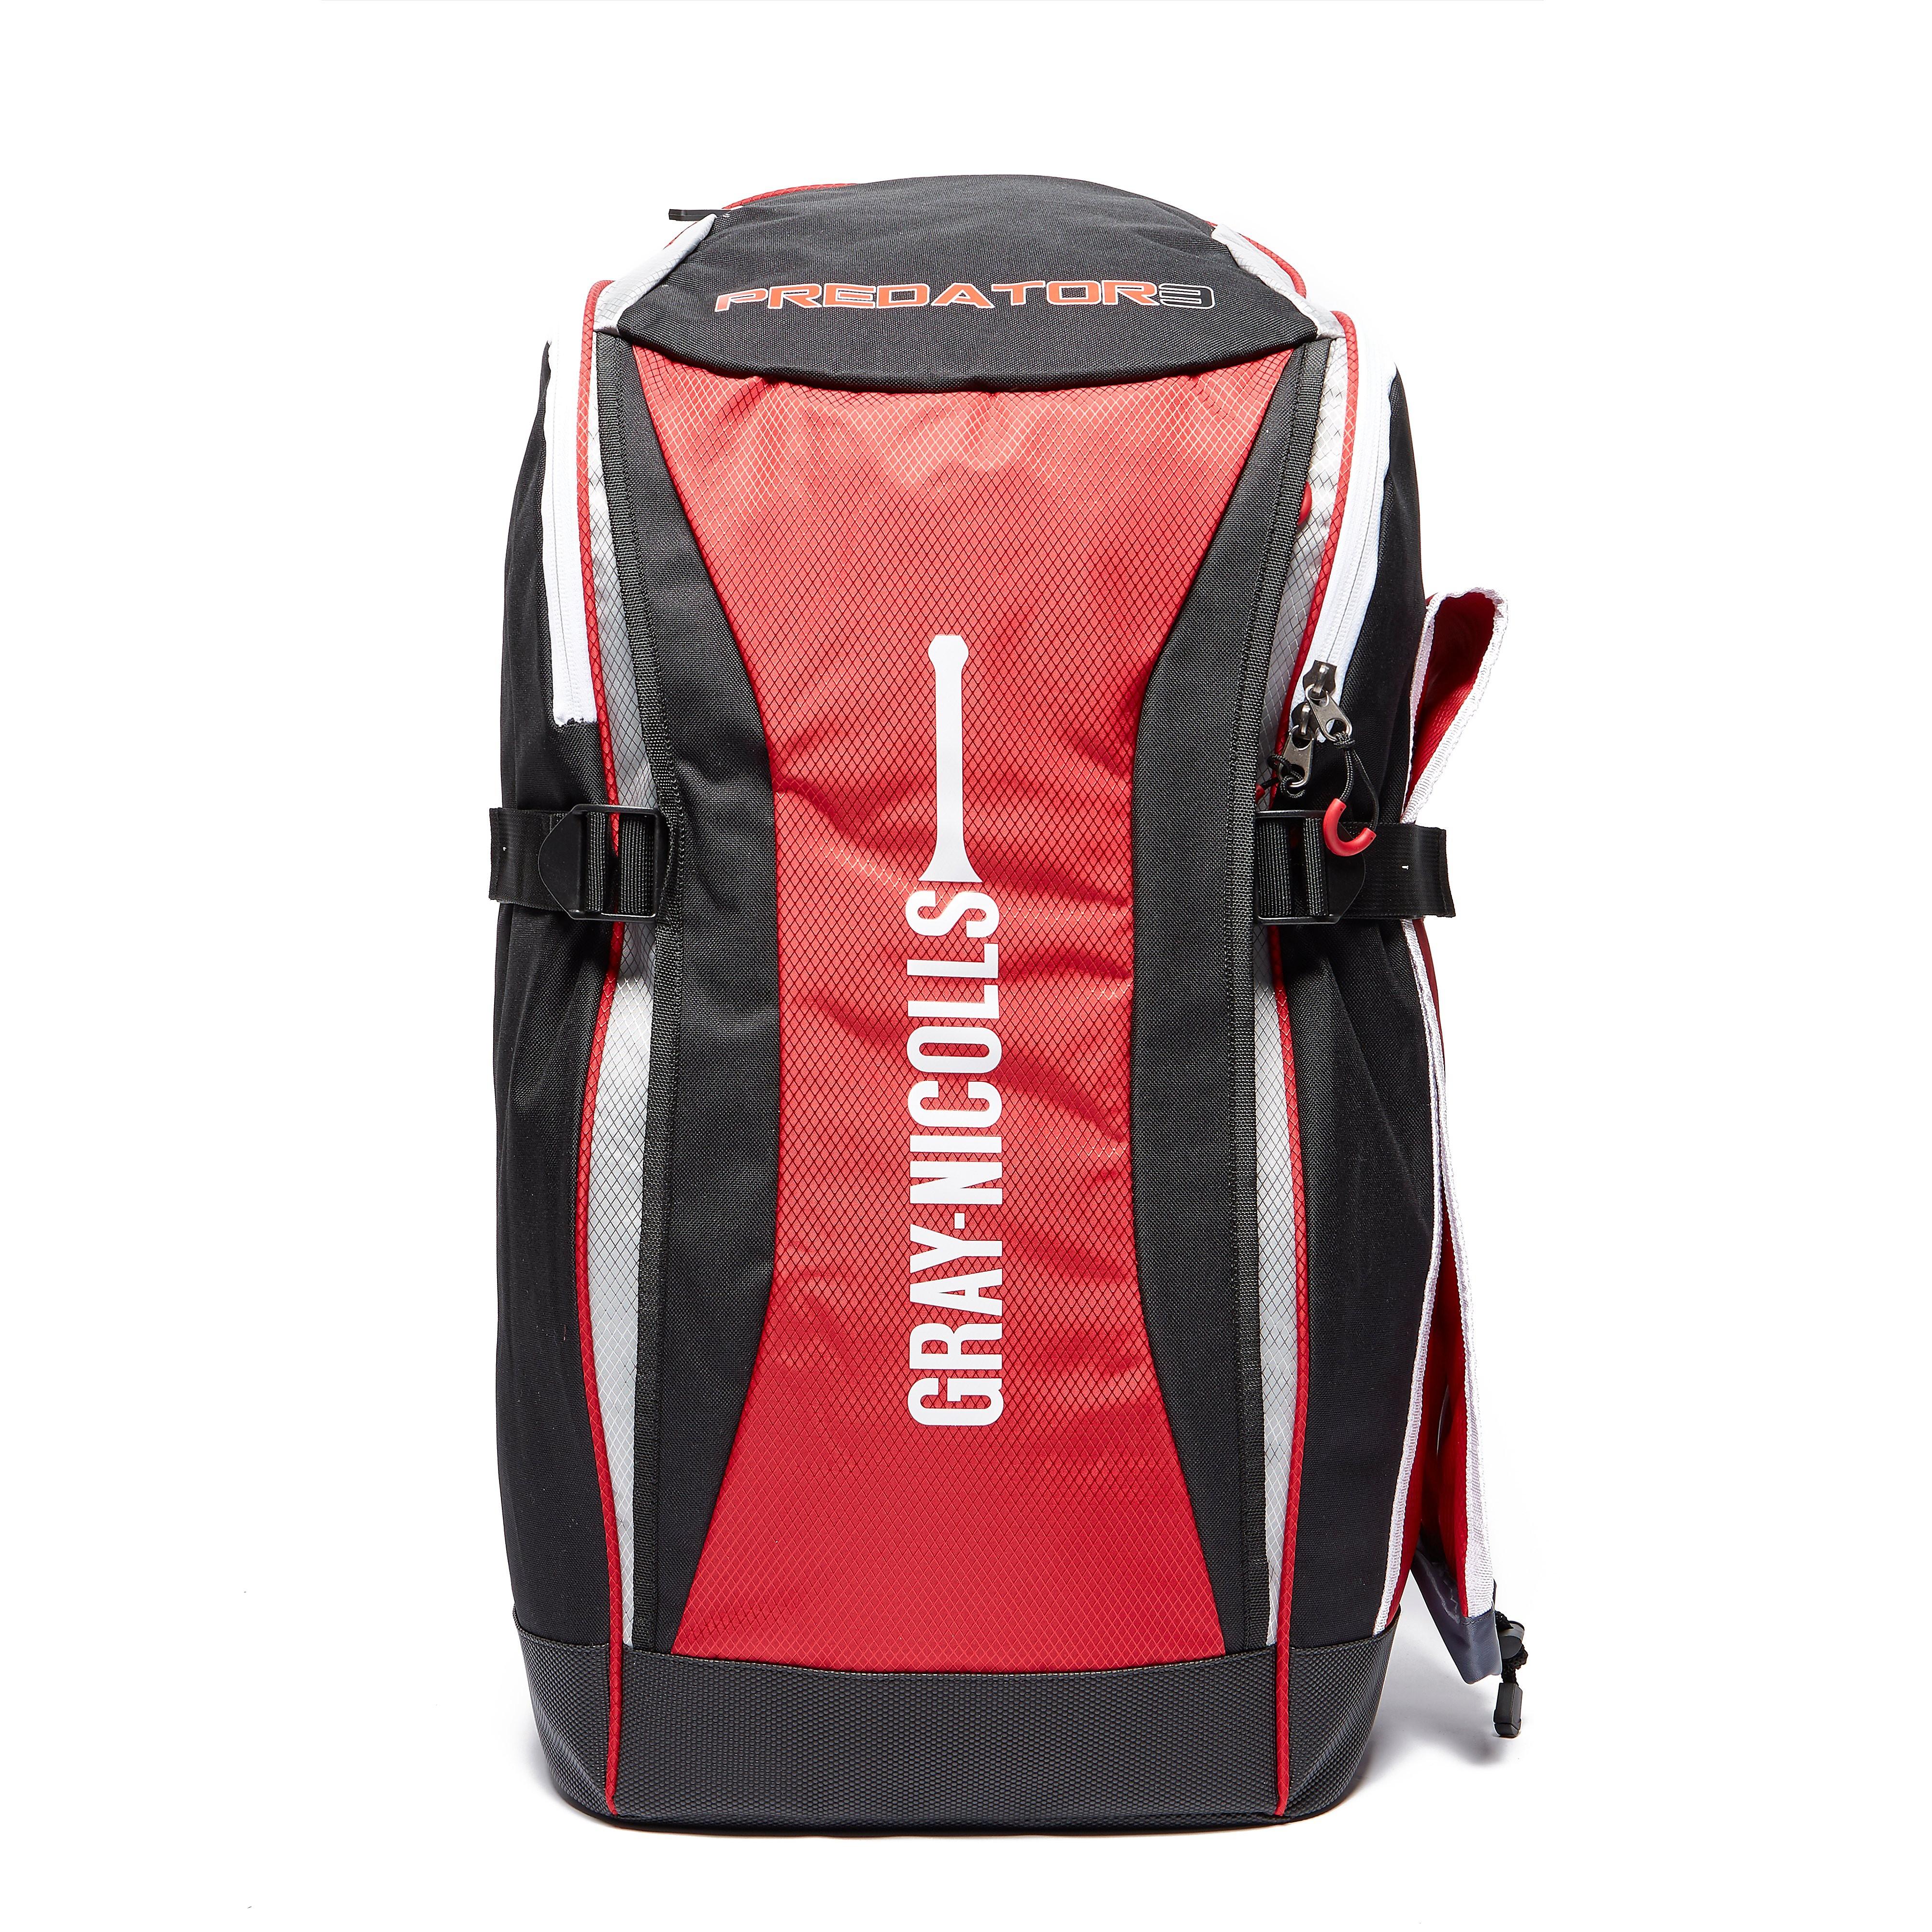 Gray Nicolls Predator 3 100 Duffle Bag